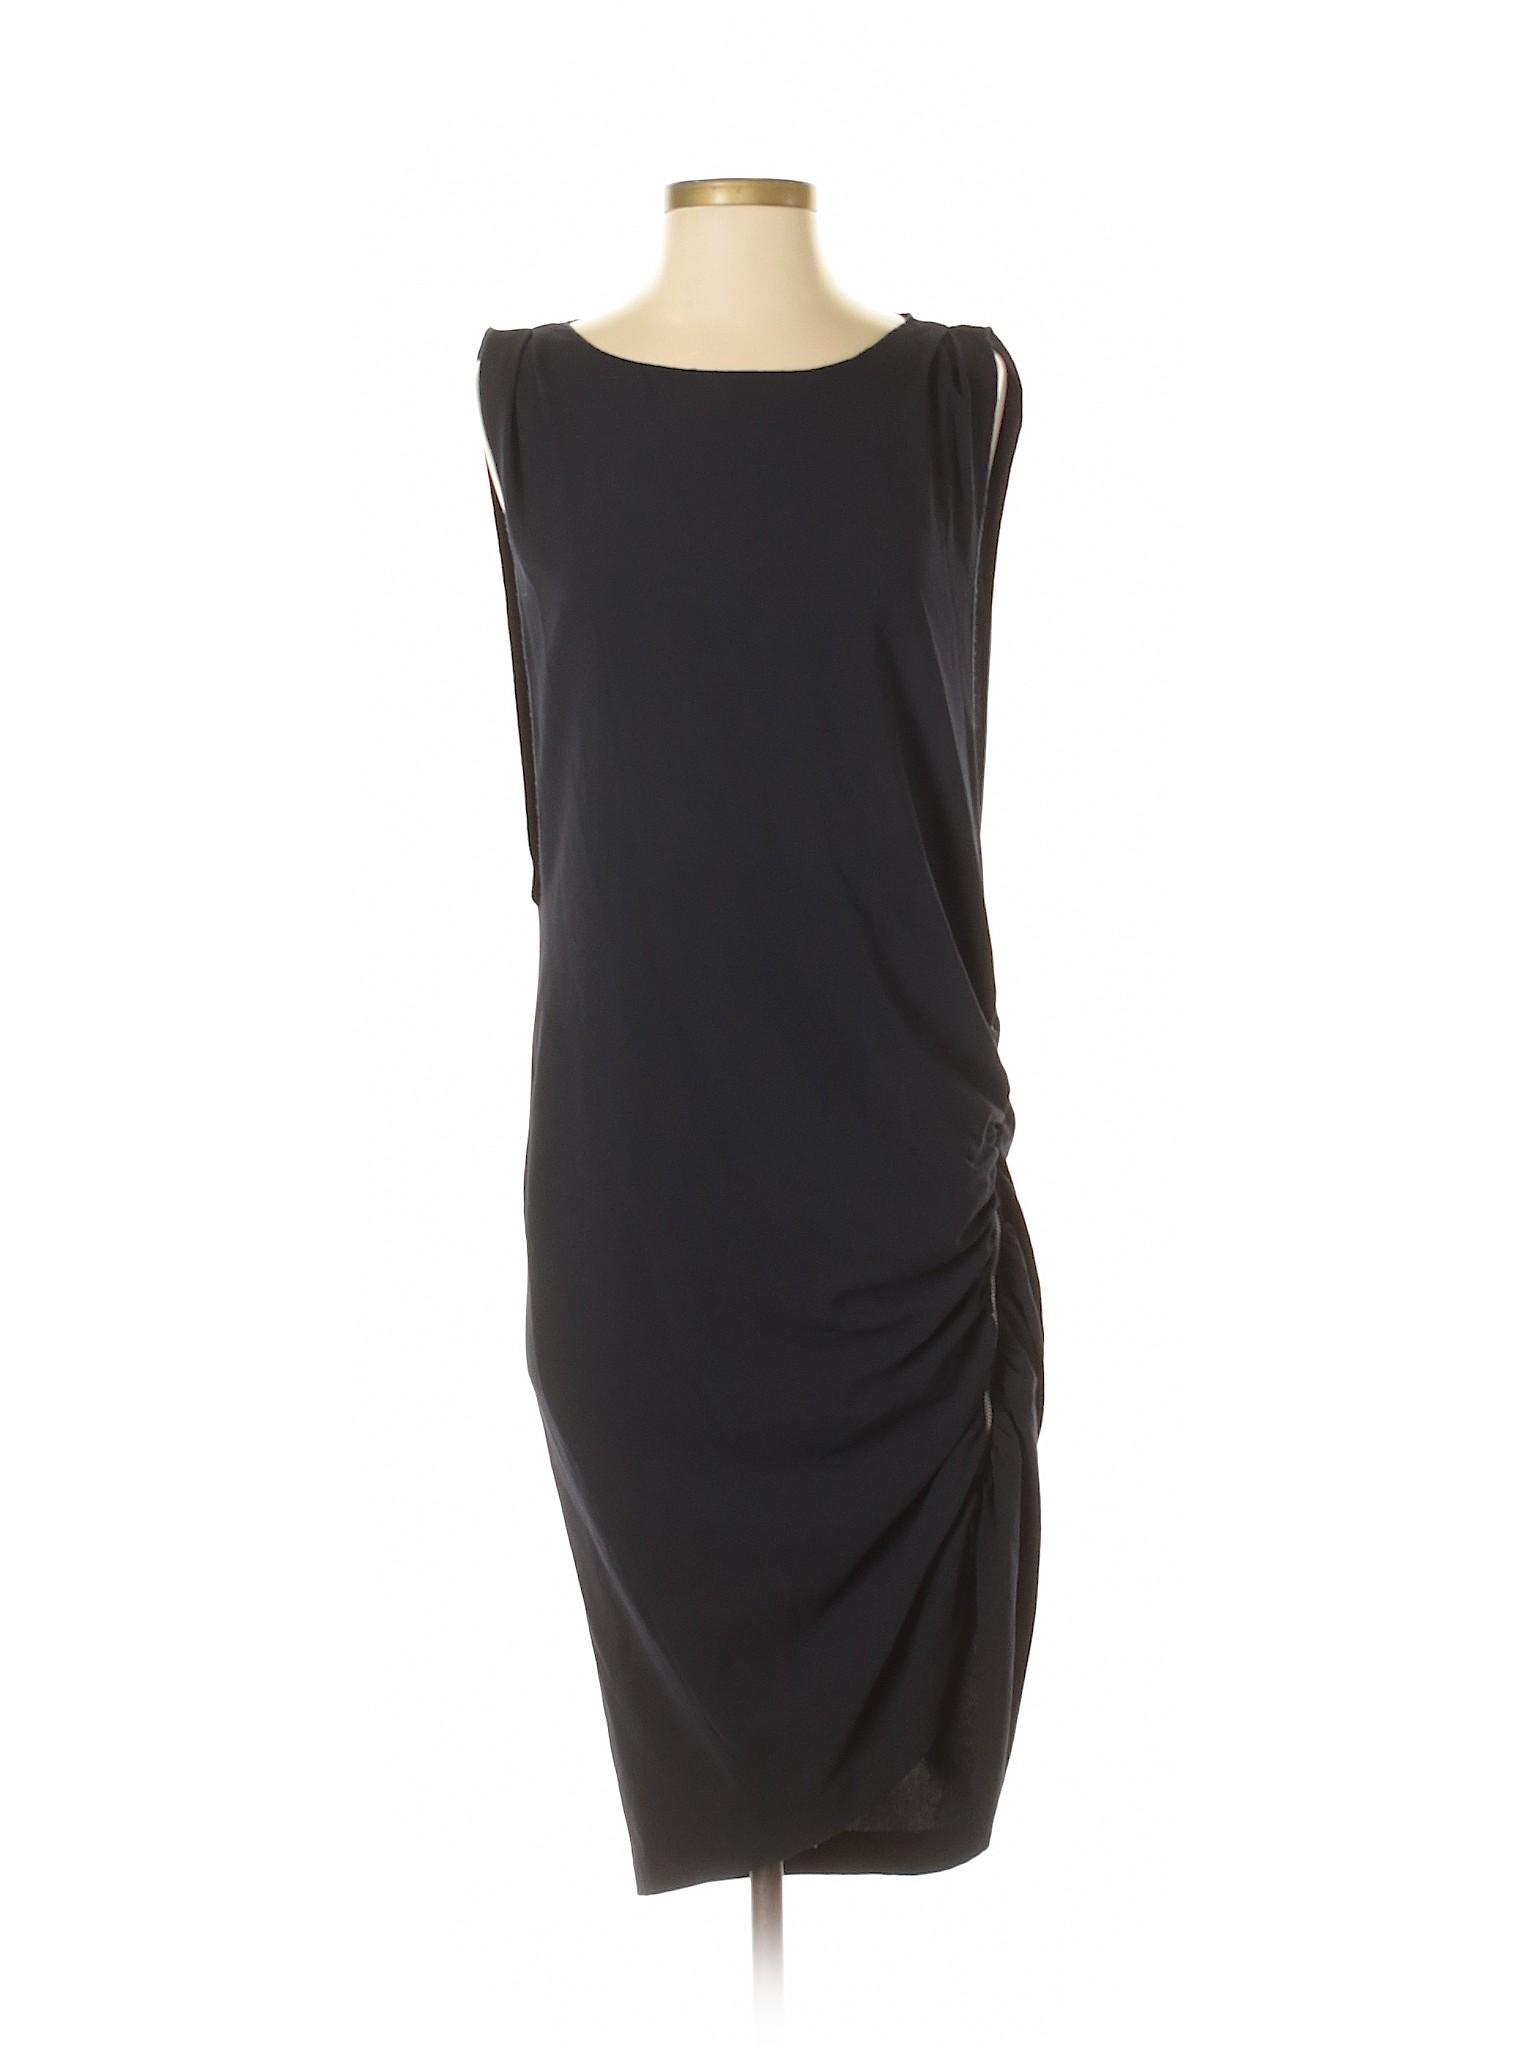 L A C Dress Casual Selling wC7X5qw